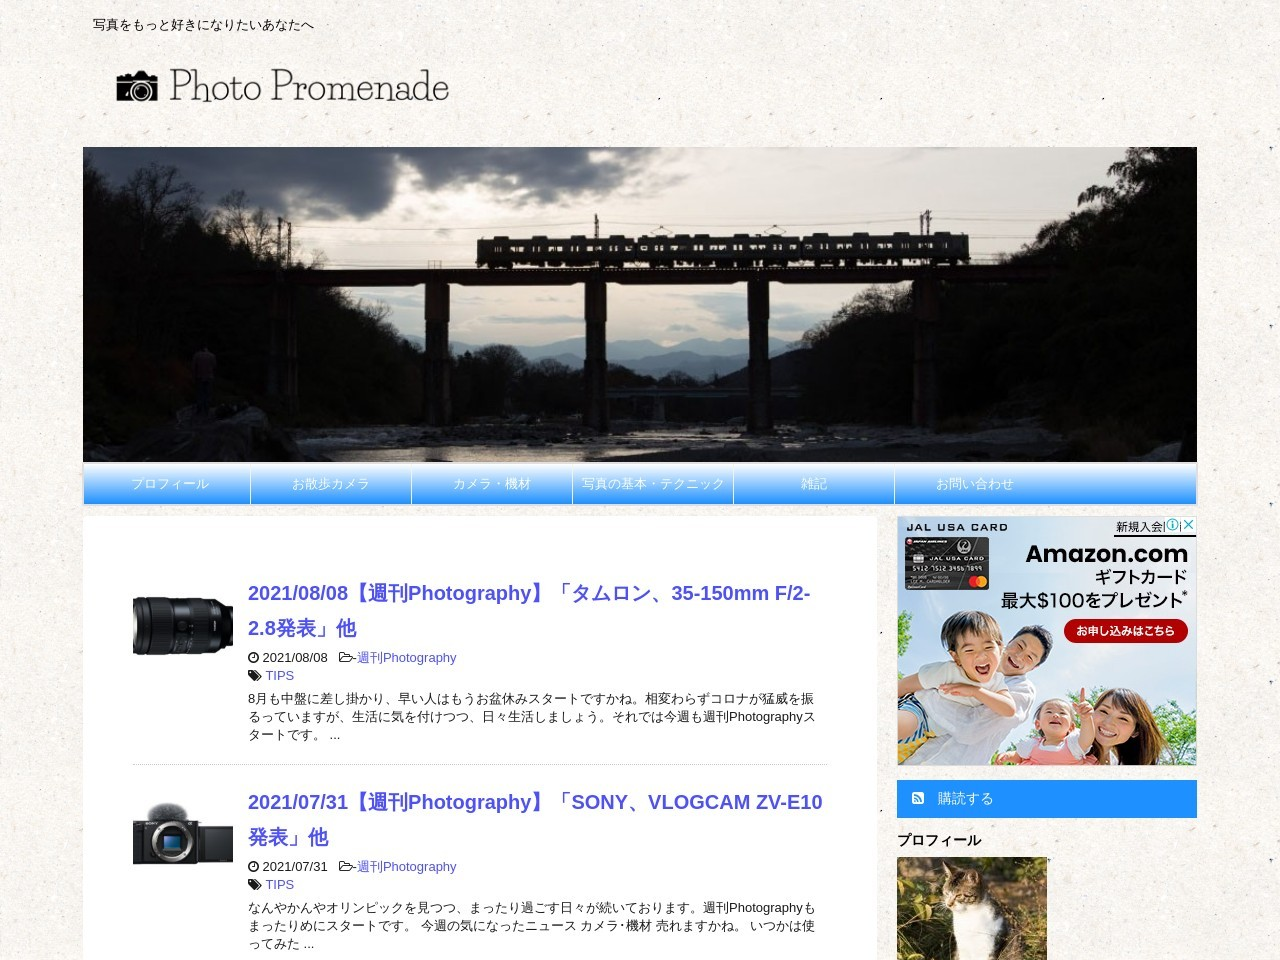 http://photo-promenade.com/cinderella-lens/